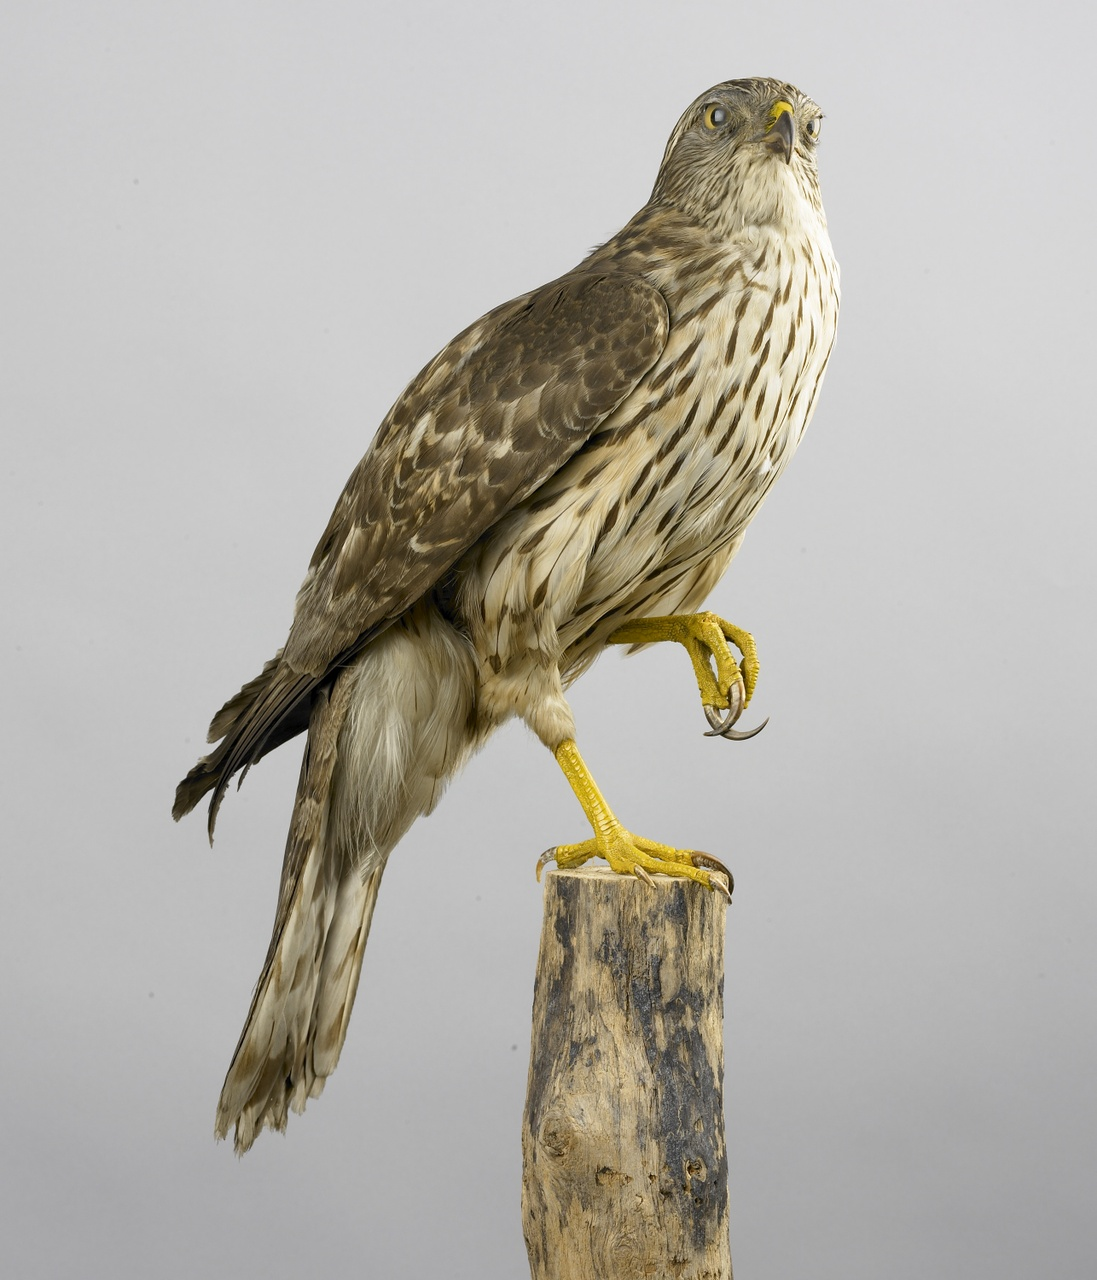 Accipiter gentilis (Linnaeus, 1758), Havik, opgezette vogel